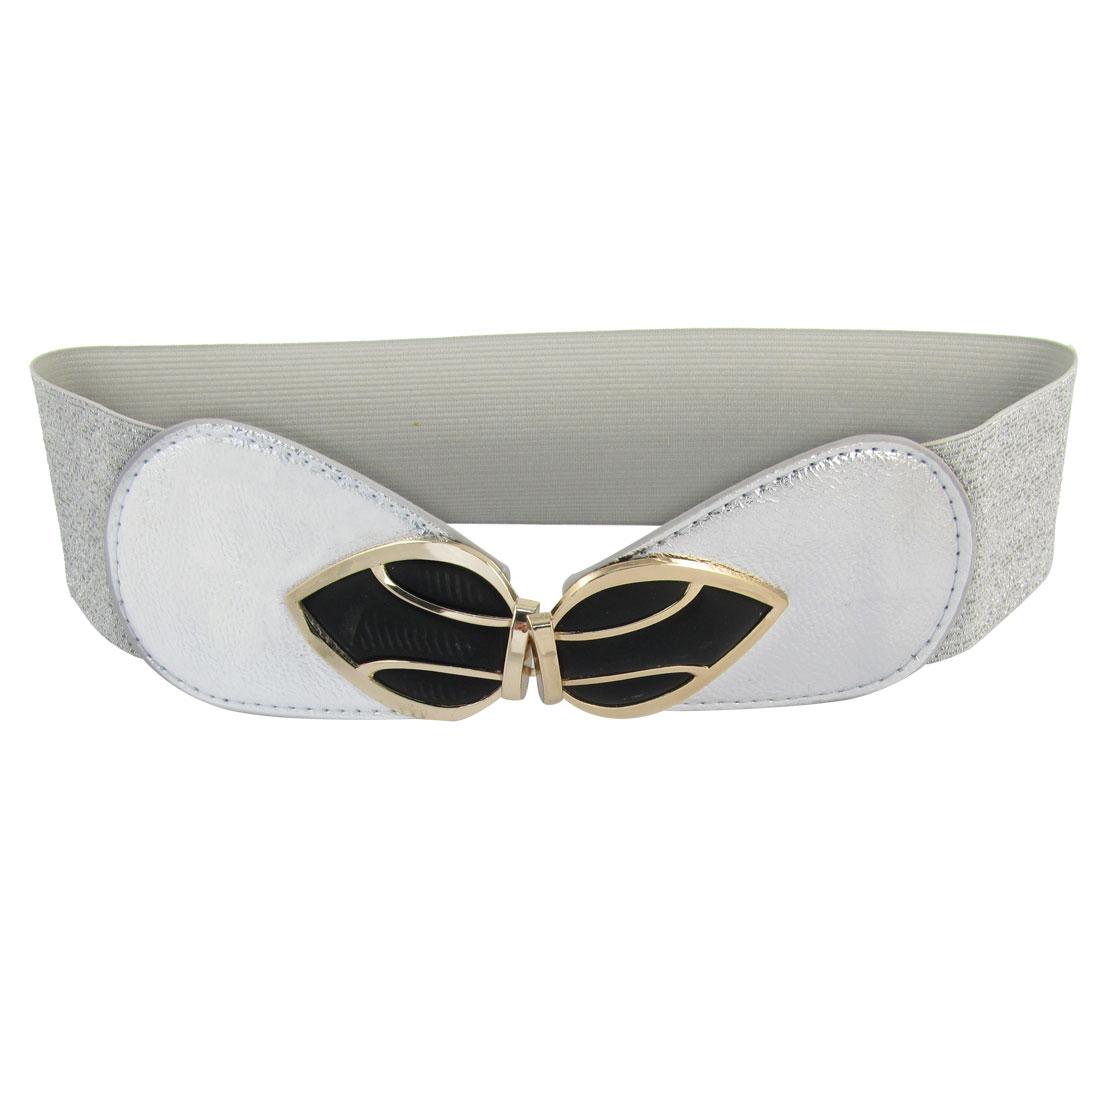 Bowknot Interlock Buckle 6cm Wide Elastic Waist Belt Band Waistband Silver Tone